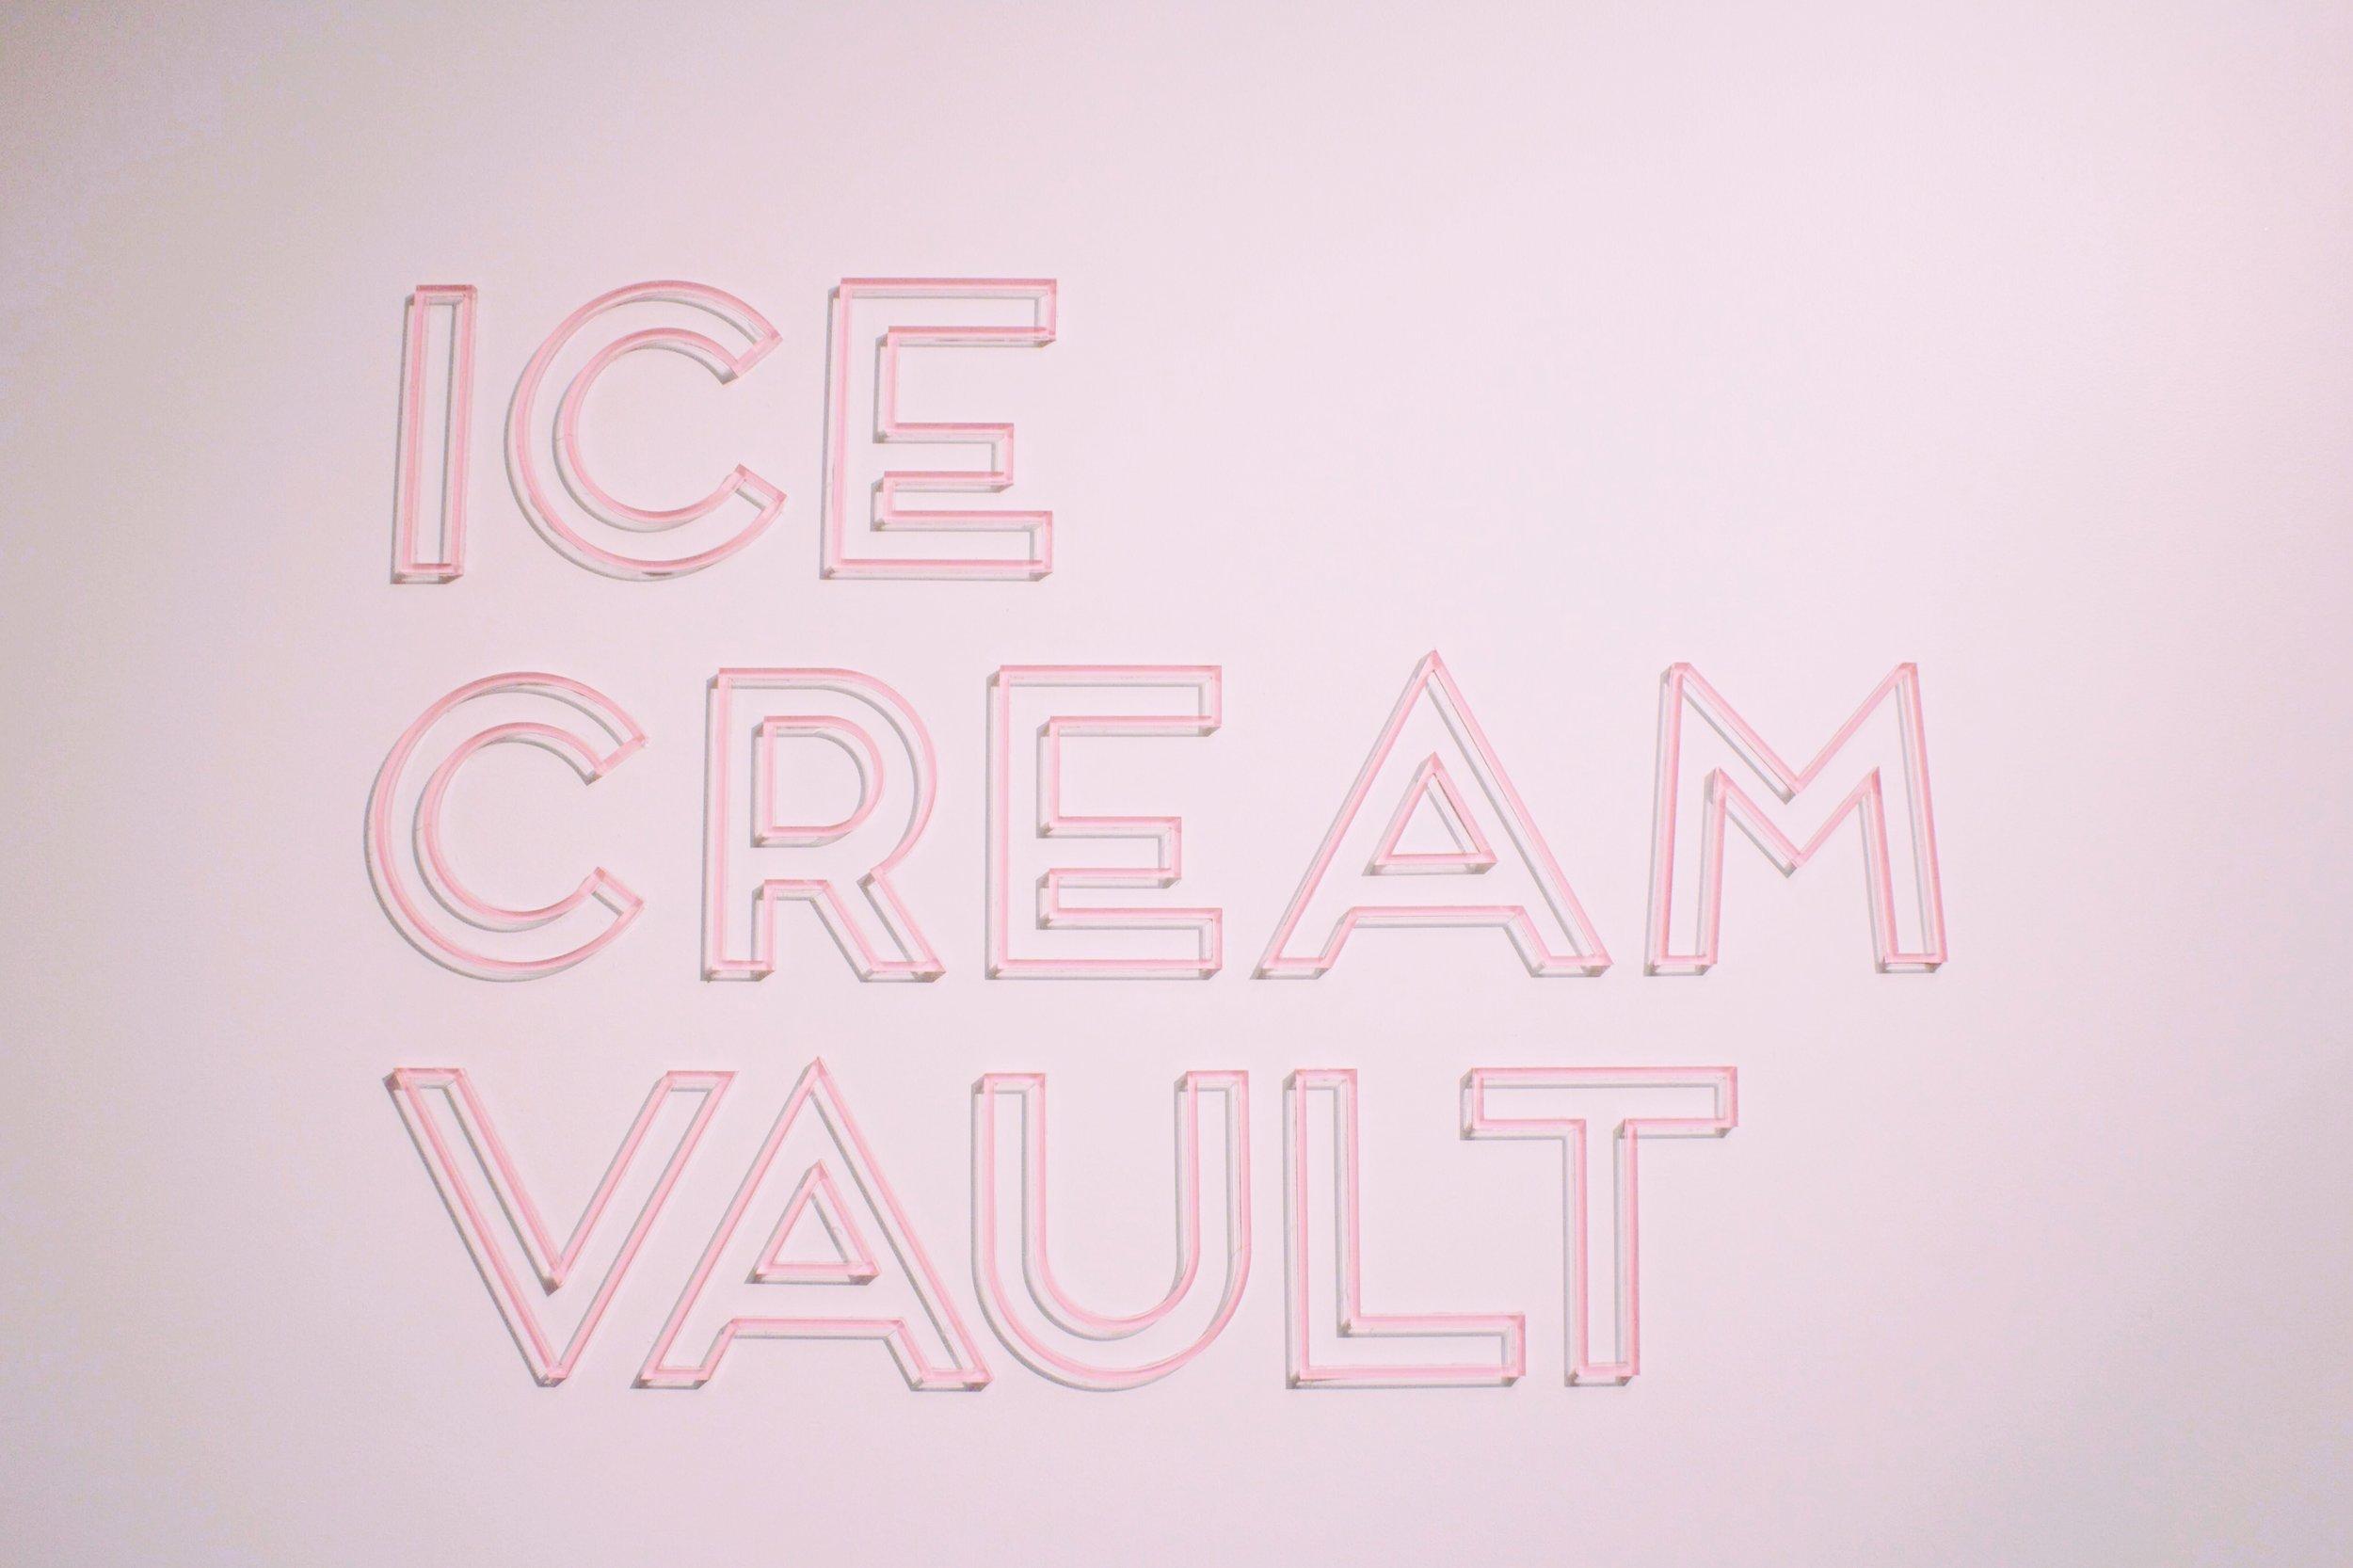 Museum of Ice Cream, Pink Neon Sign